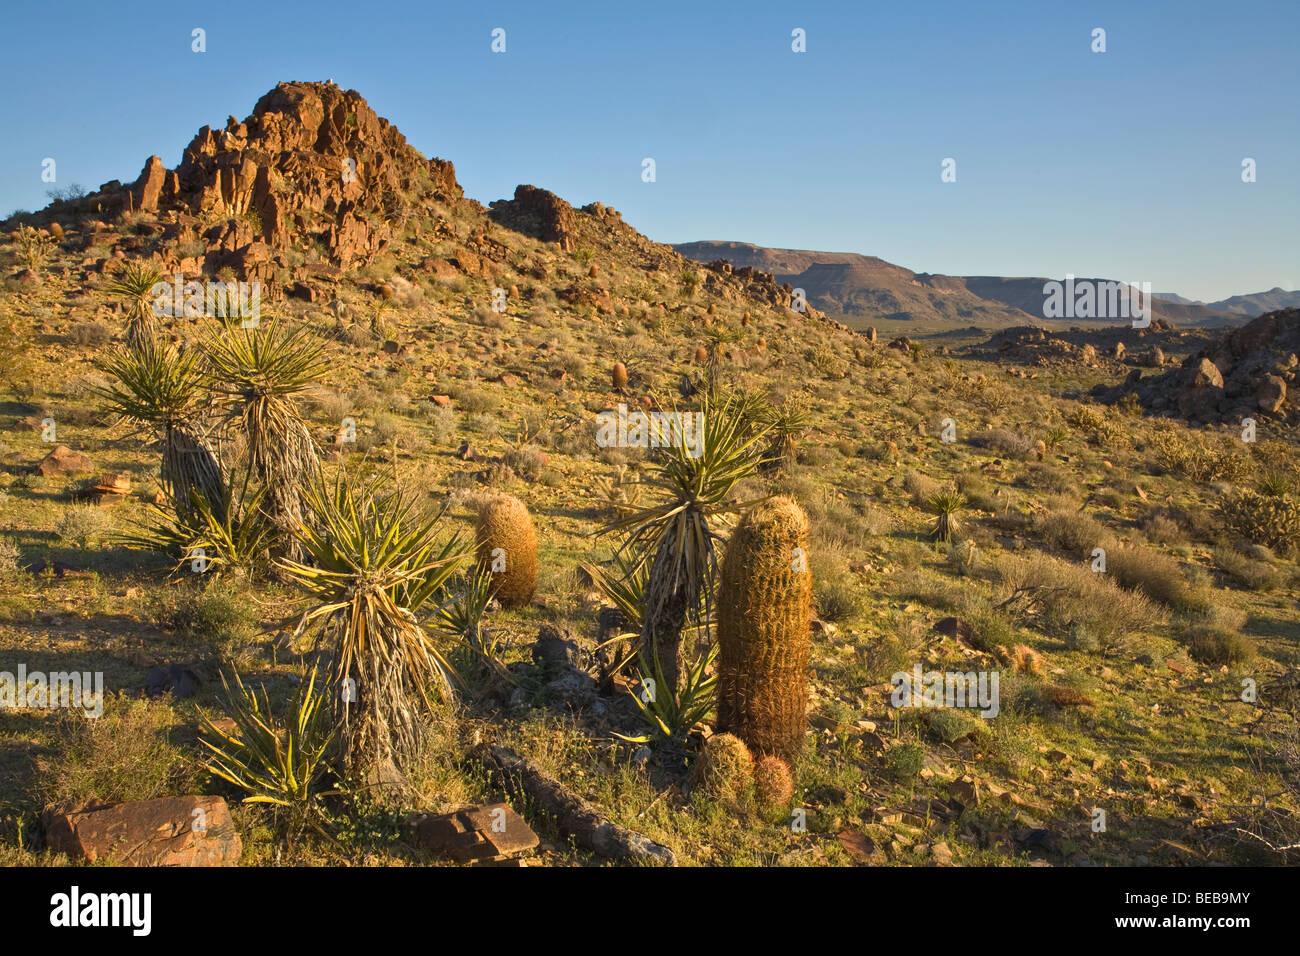 Mojave Desert vegetation, barrel cactus and yucca in Colton Hills area of Mojave National Preserve, California - Stock Image